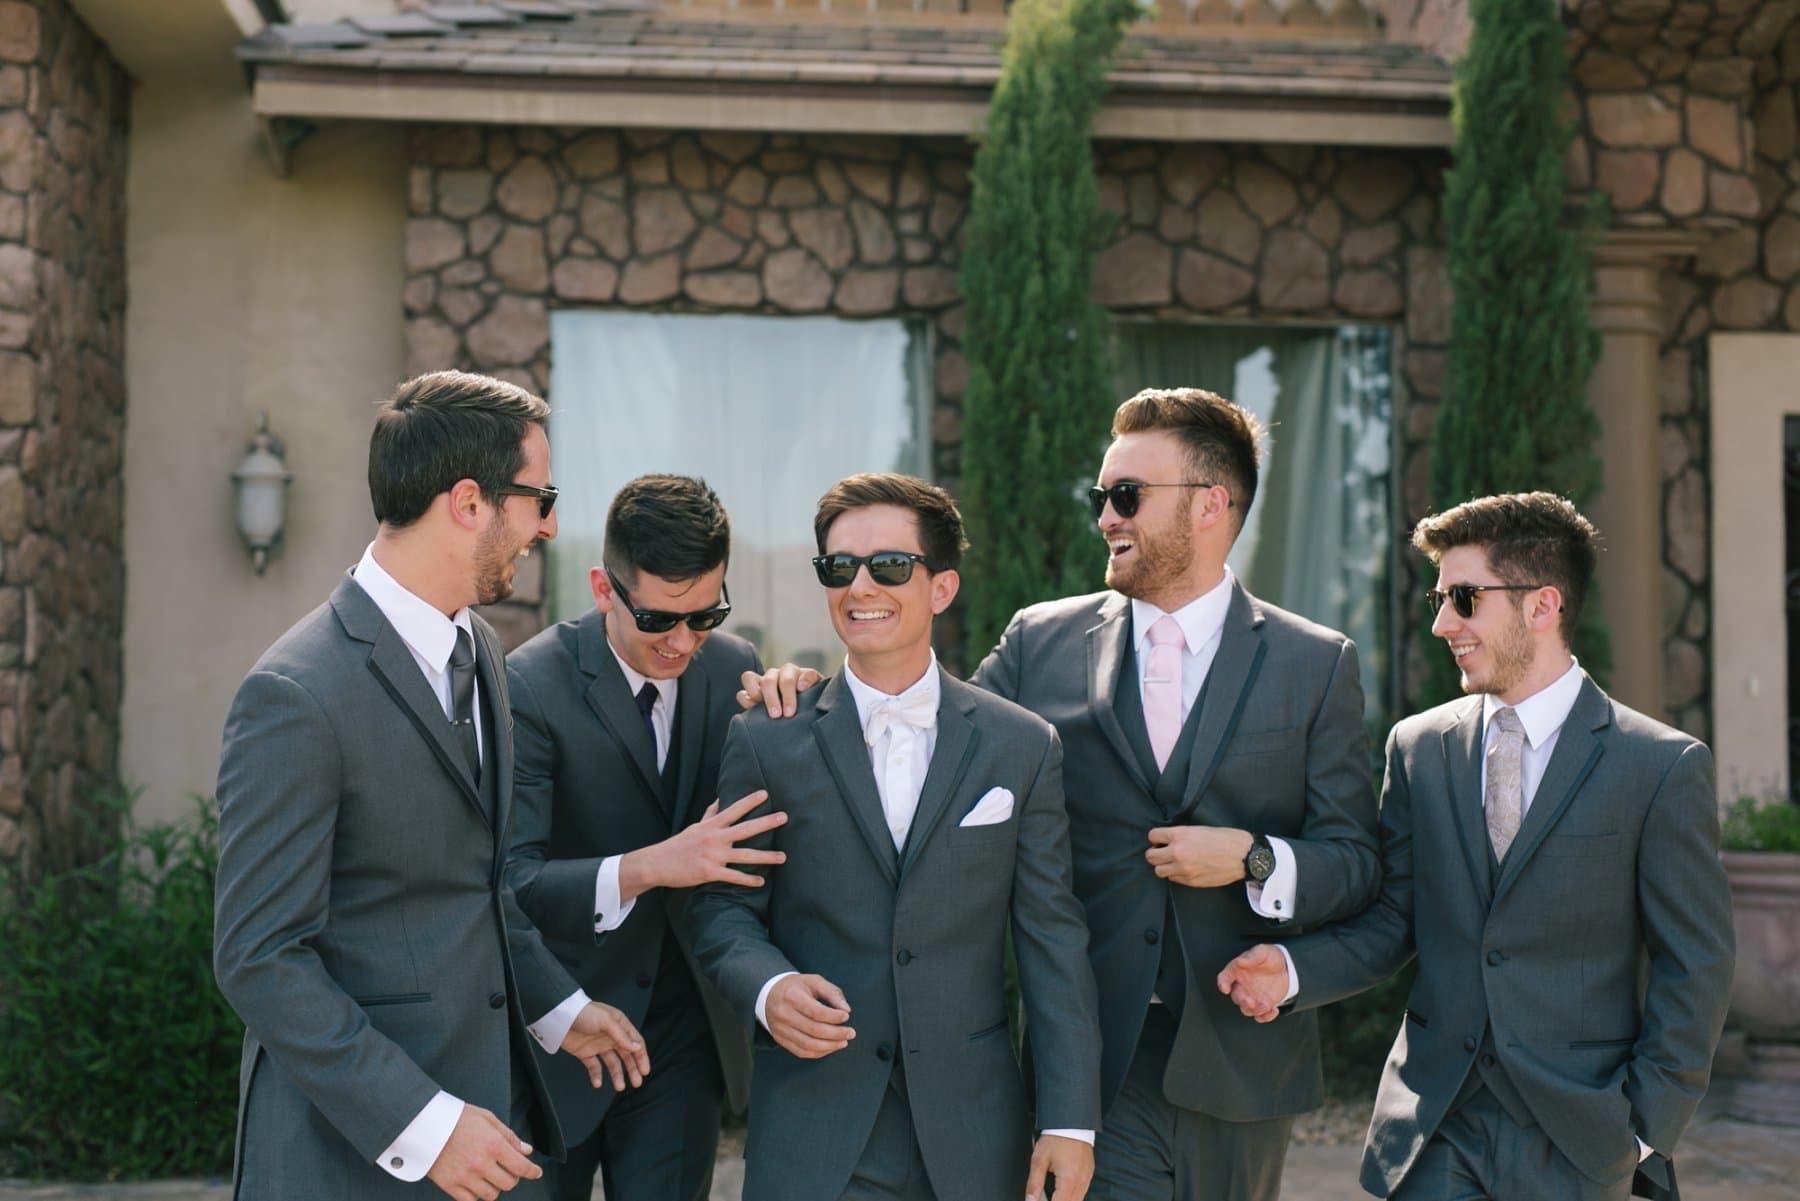 groomsmen at Superstition Manor in Mesa AZ wedding